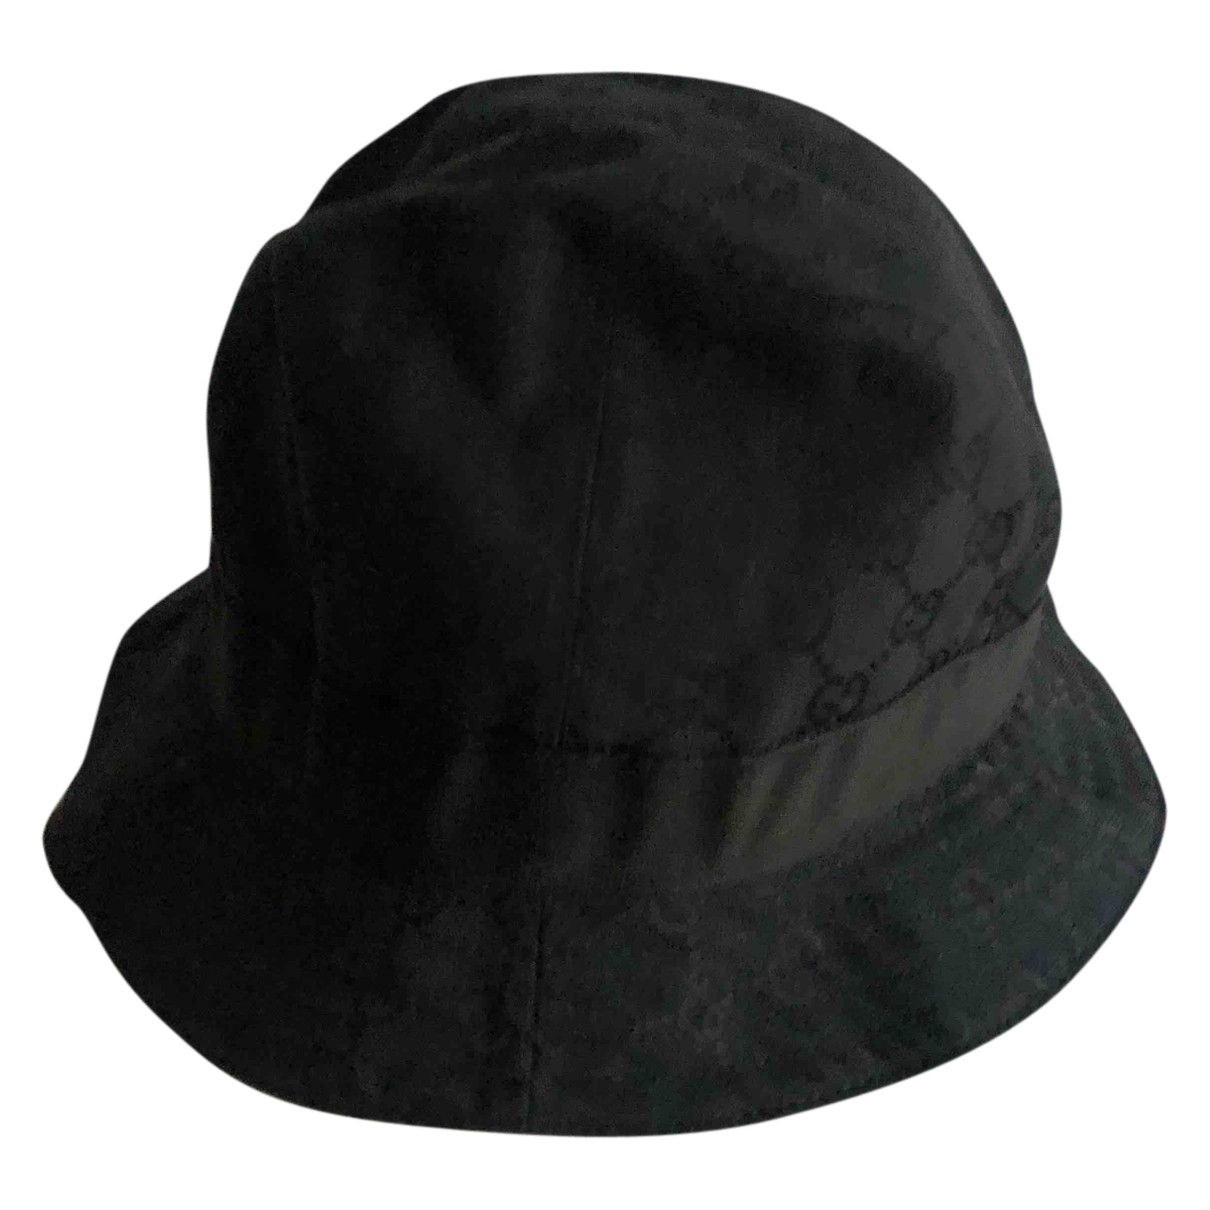 Gucci \N Black Cloth hat for Women L International